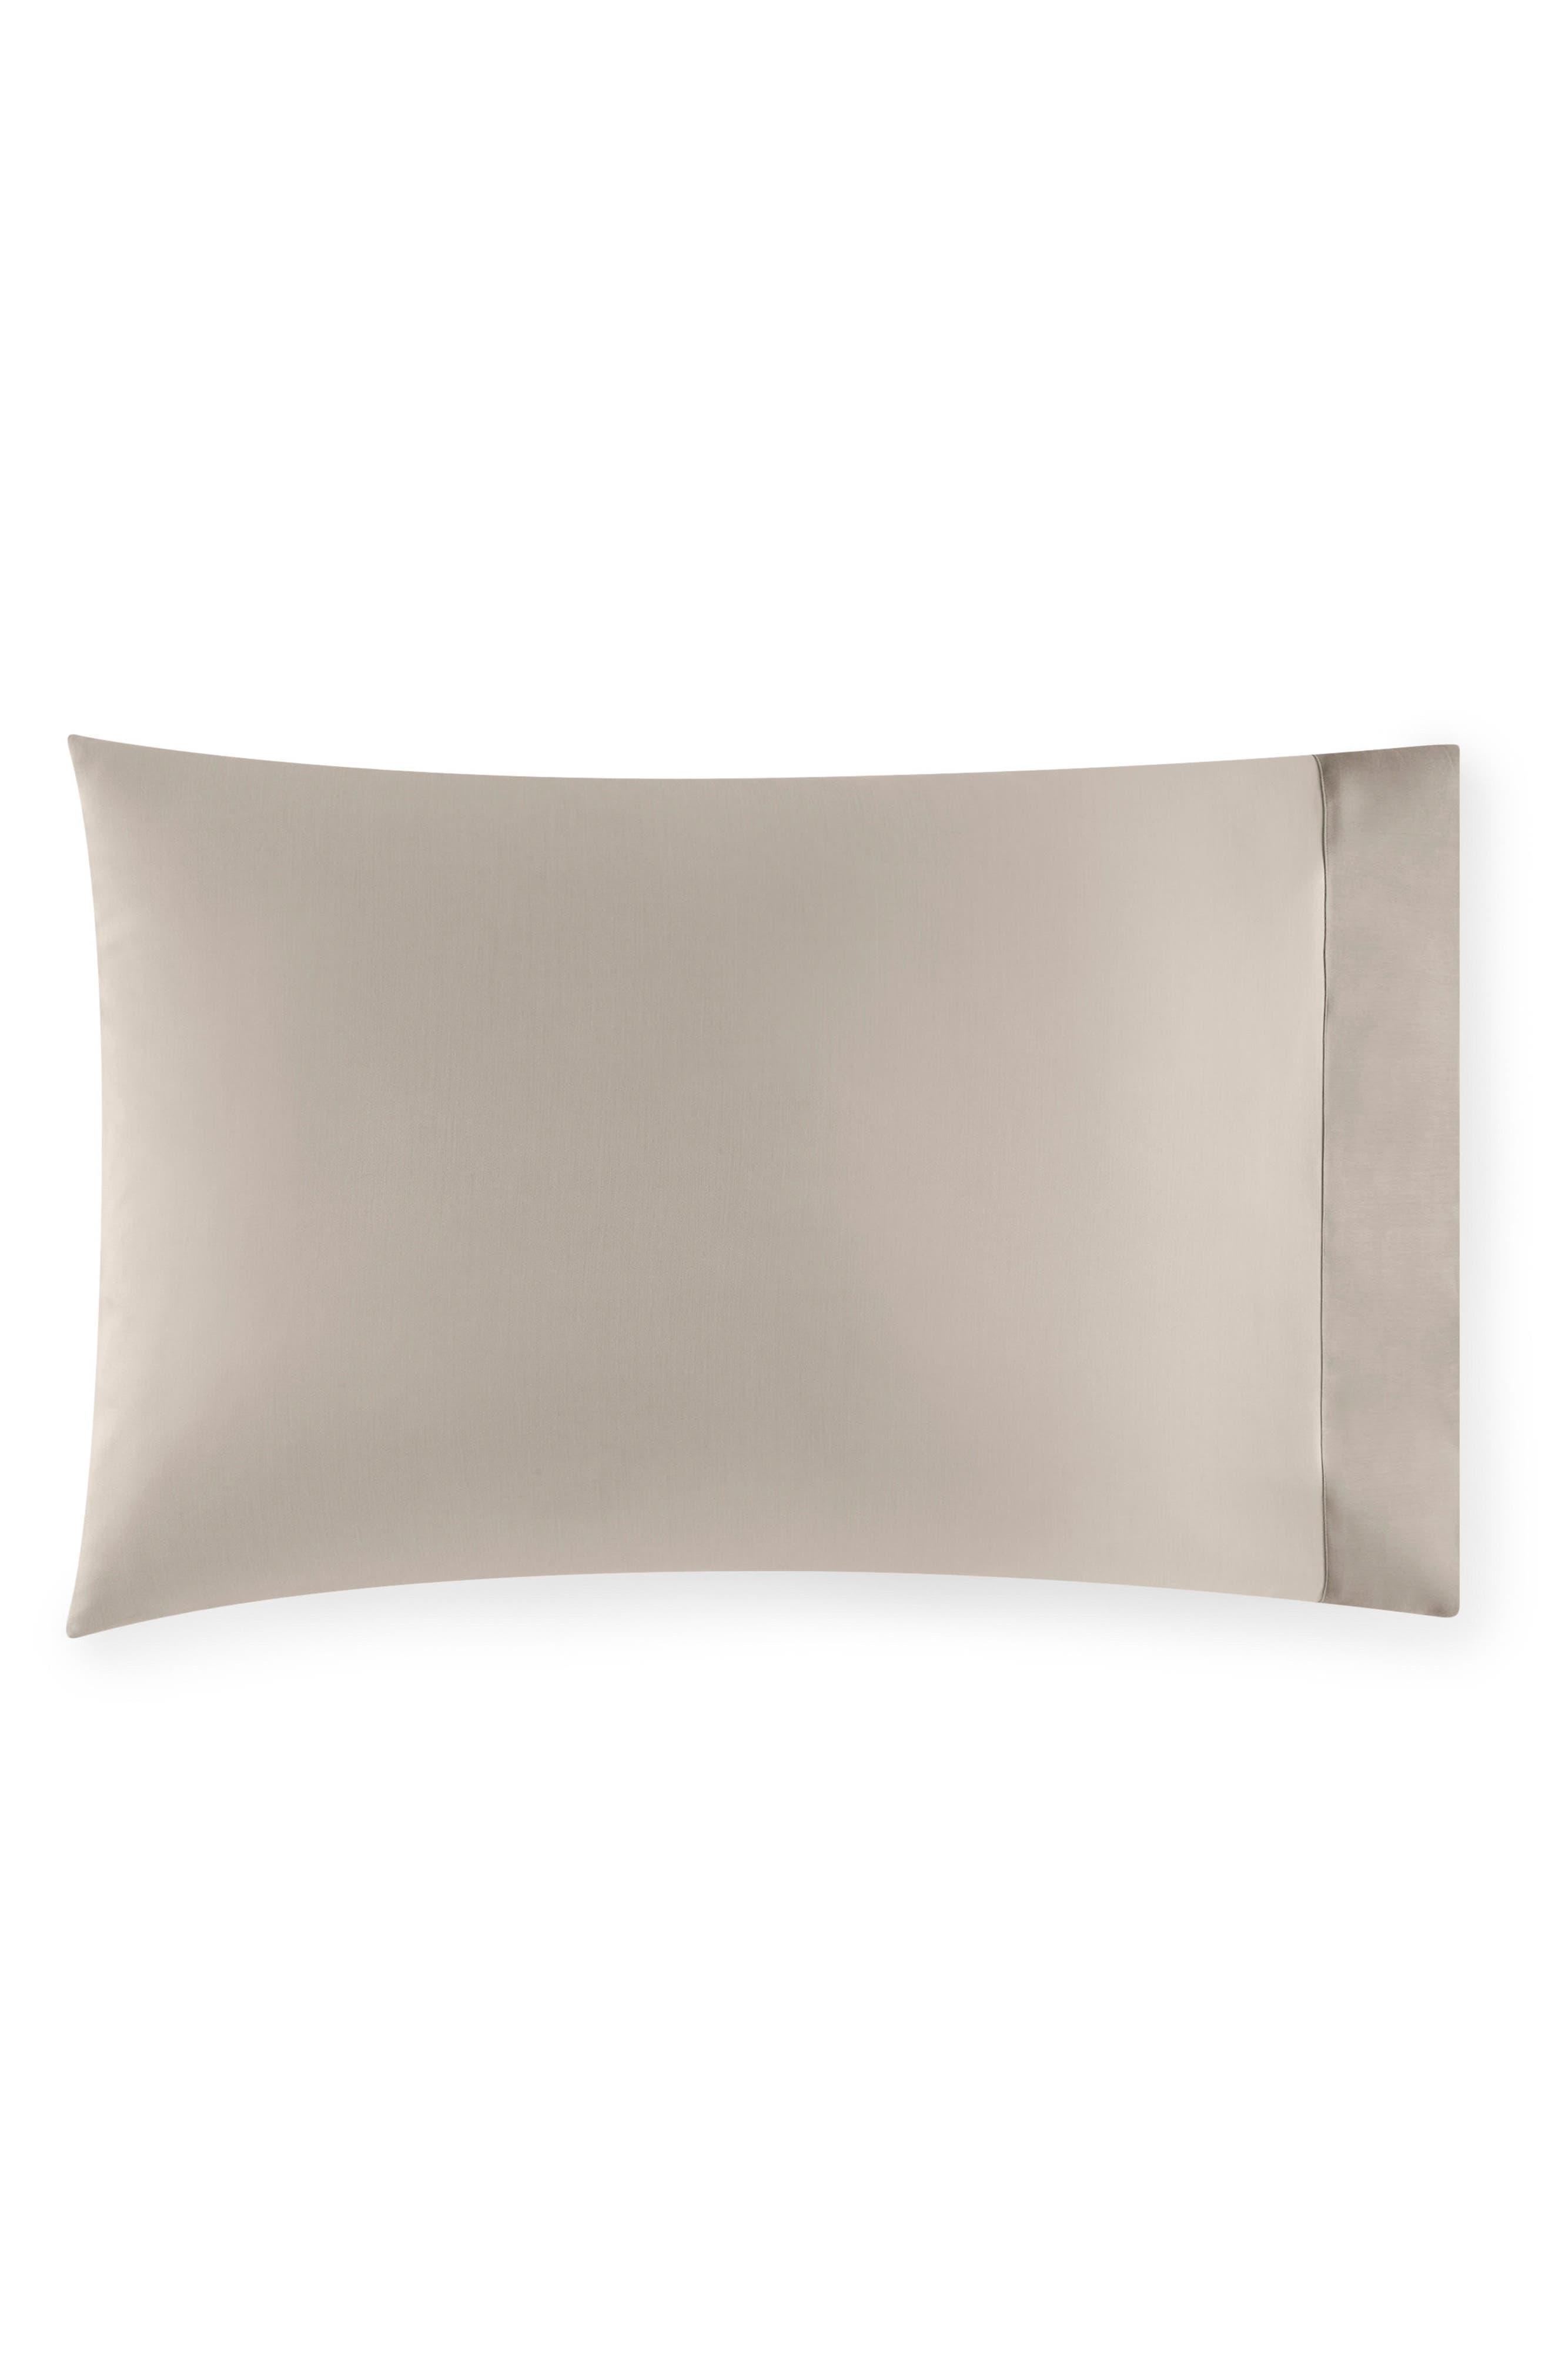 SFERRA, Larro Pillowcase, Main thumbnail 1, color, NOUGAT